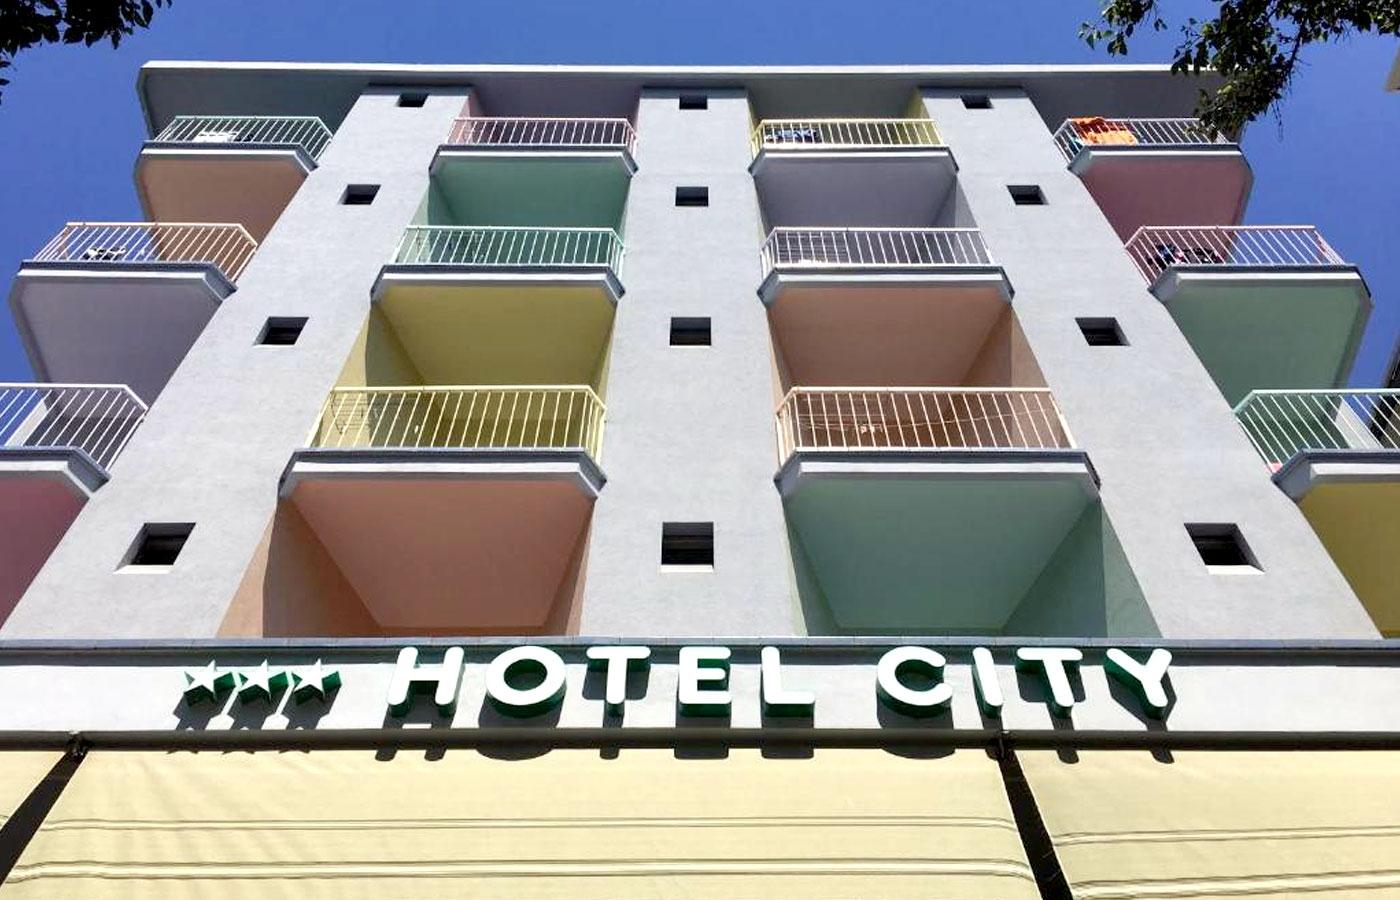 hotel-city-rimini